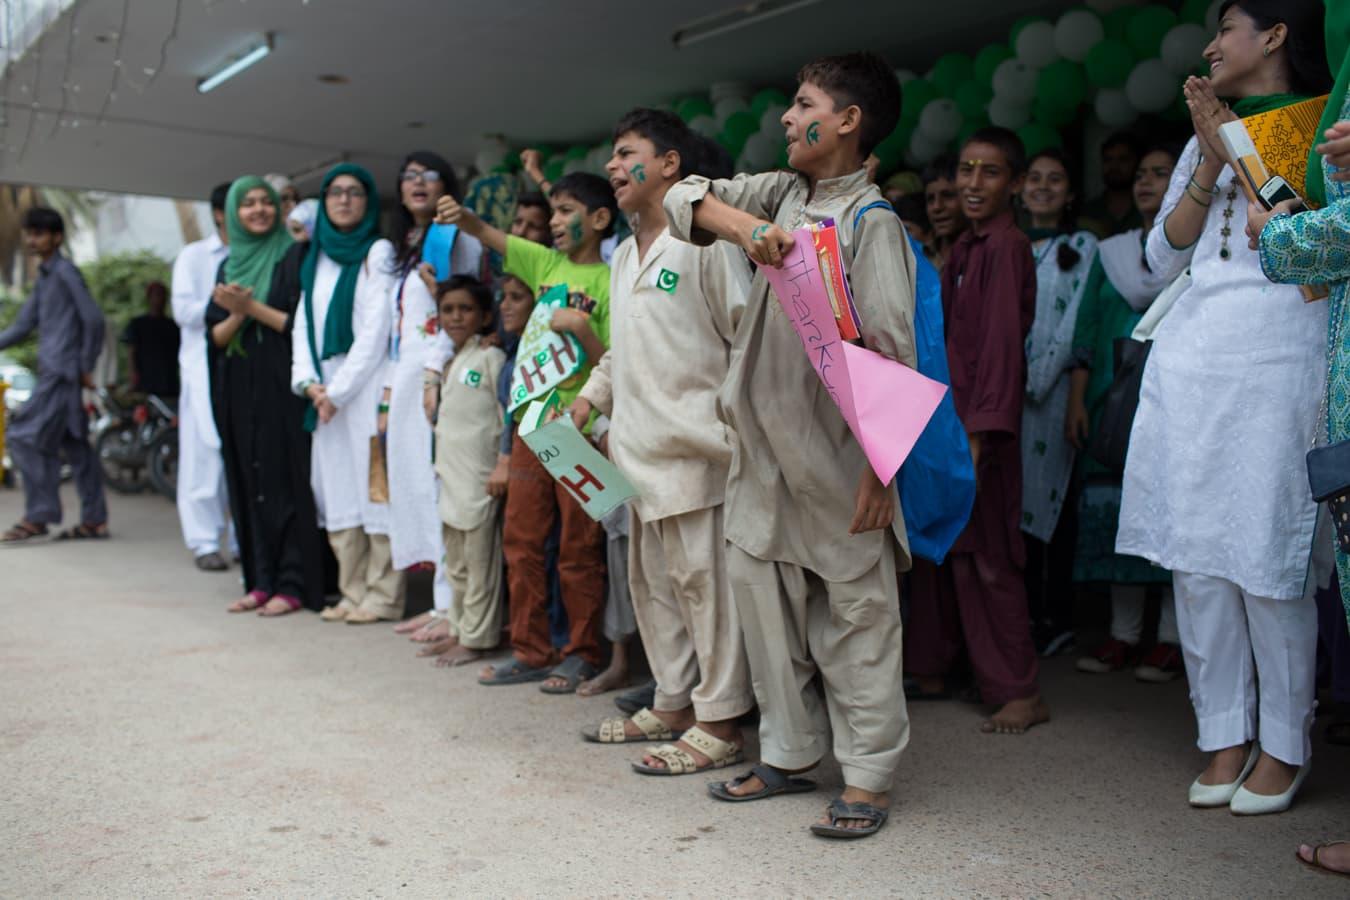 Chanting 'Pakistan Zindabad' after the National Anthem.